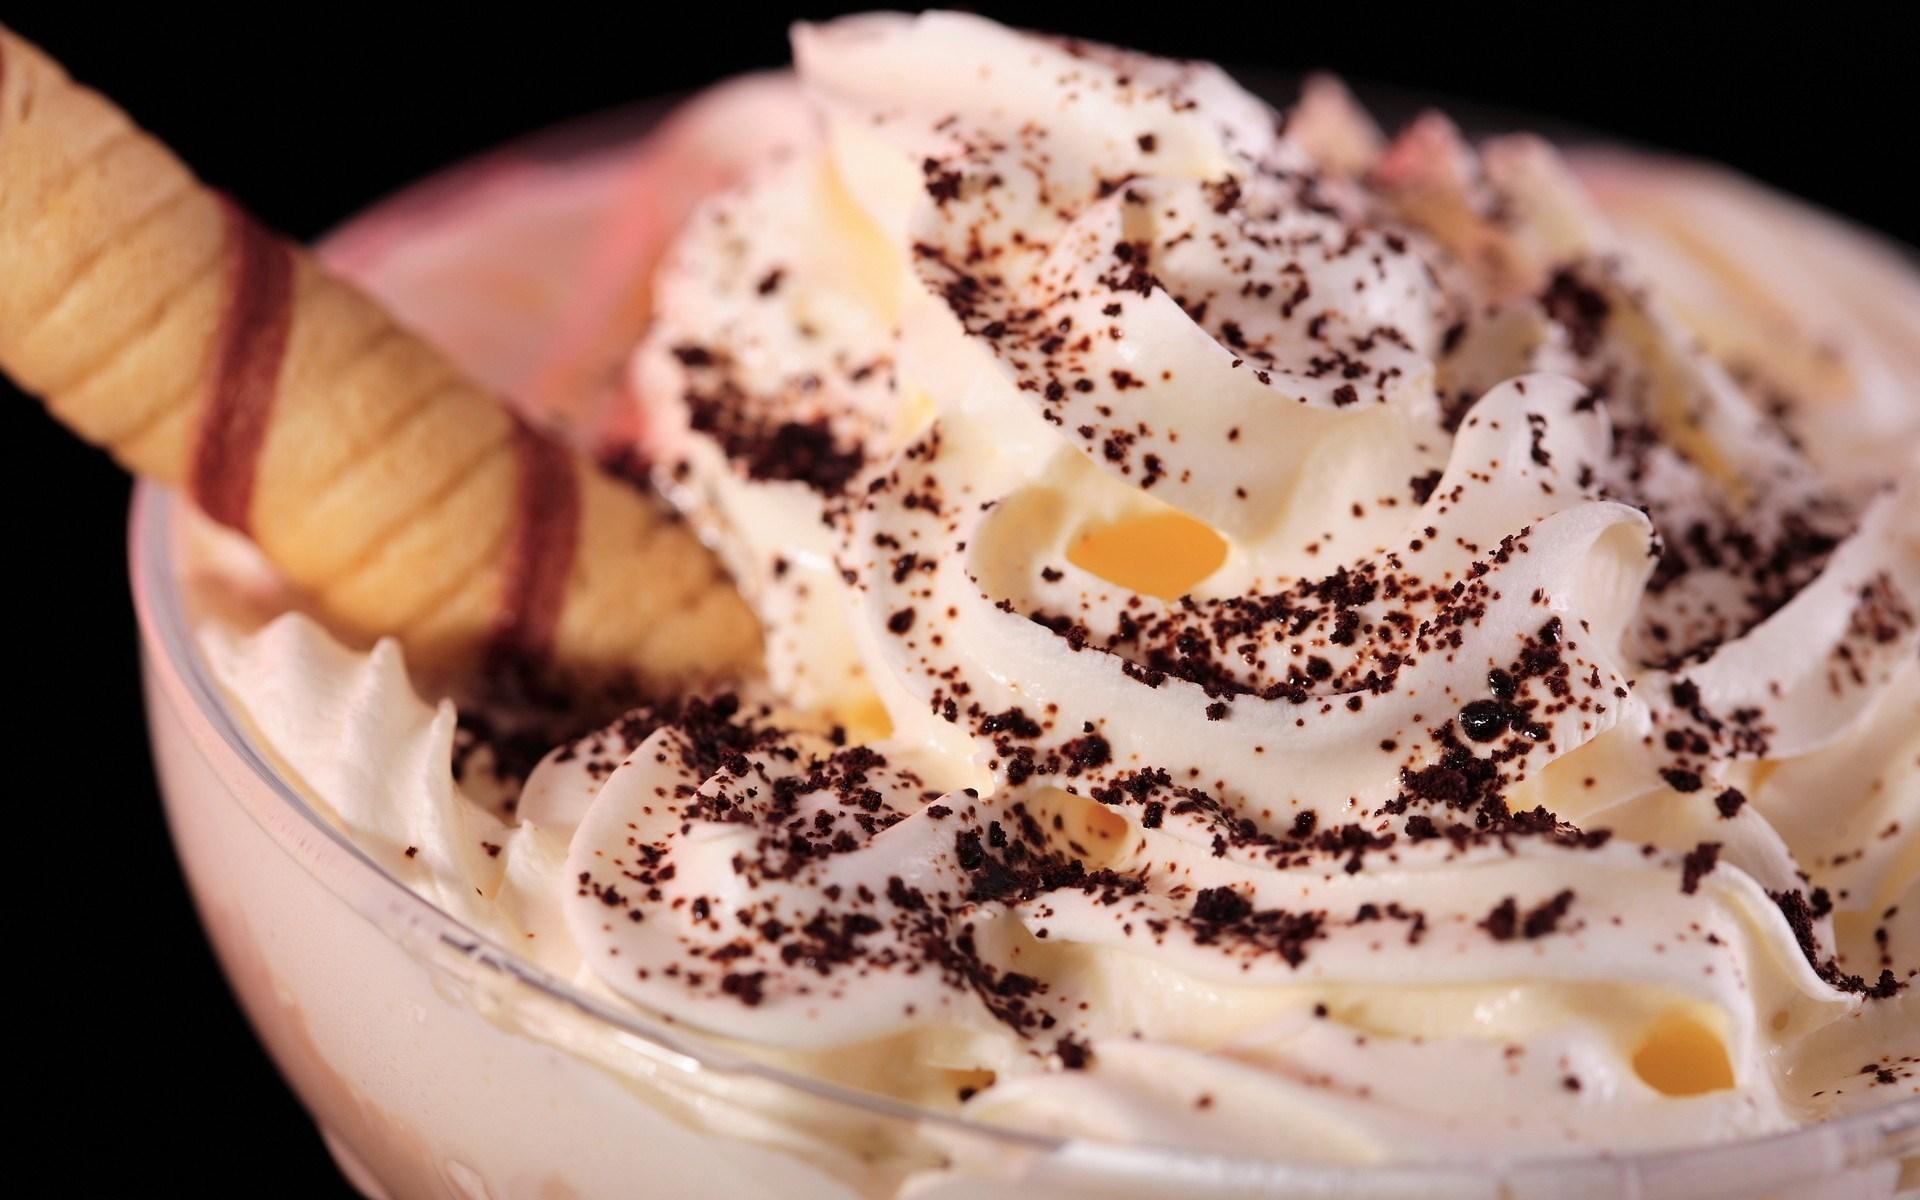 Whip Cream Macro Dessert Cacao Powder HD Wallpaper